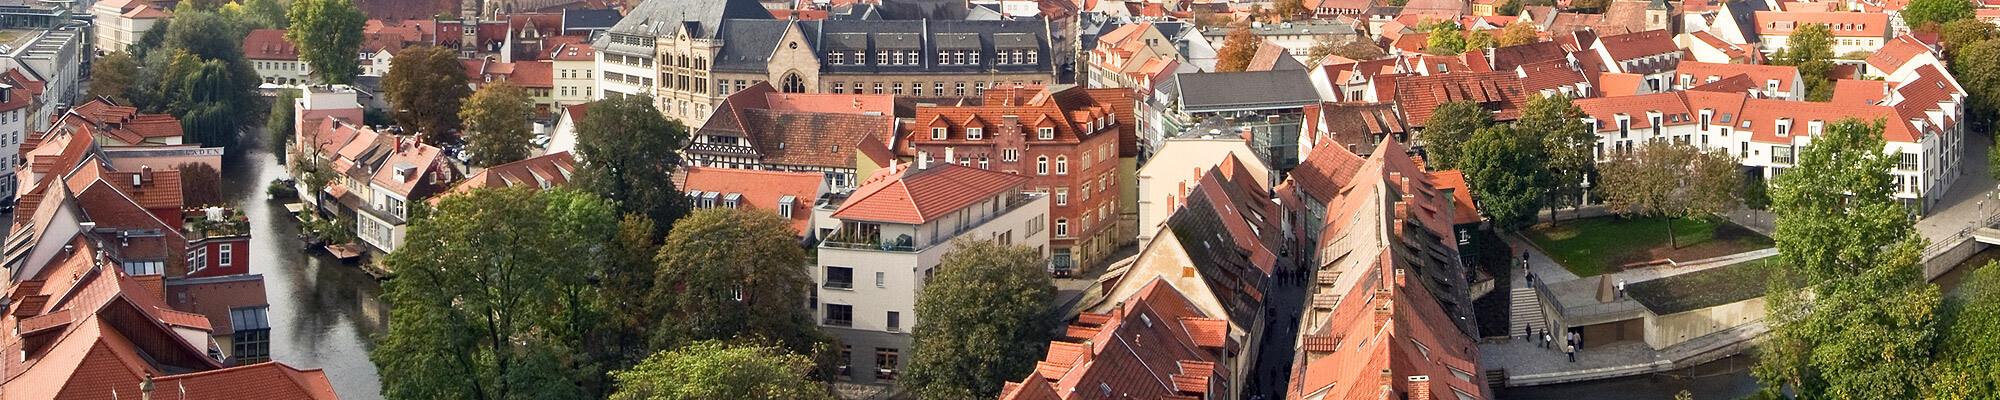 Erfurt-05